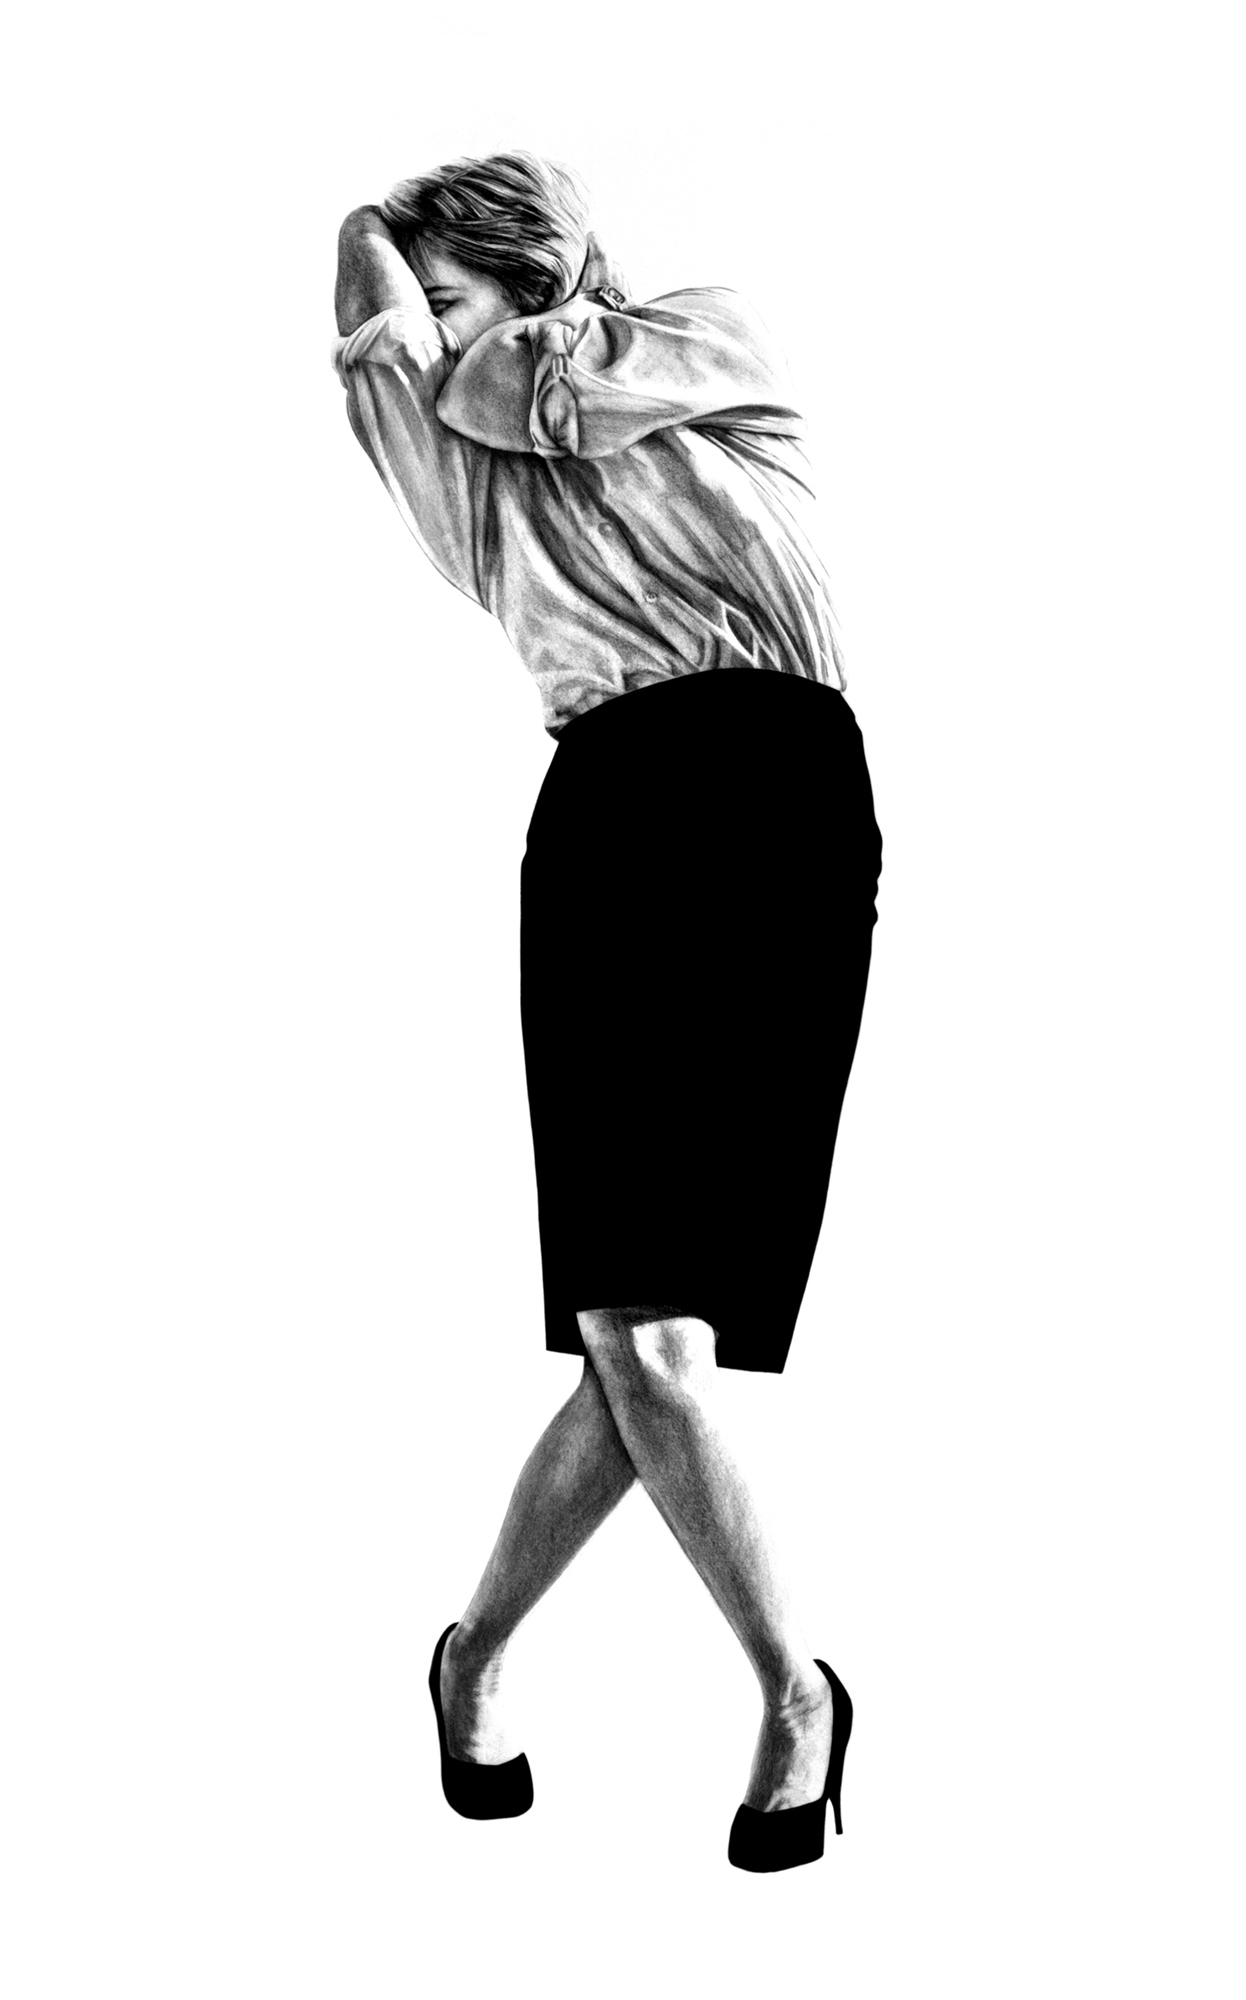 Figura 1 - Roberto Longo, Sem título, 1981.